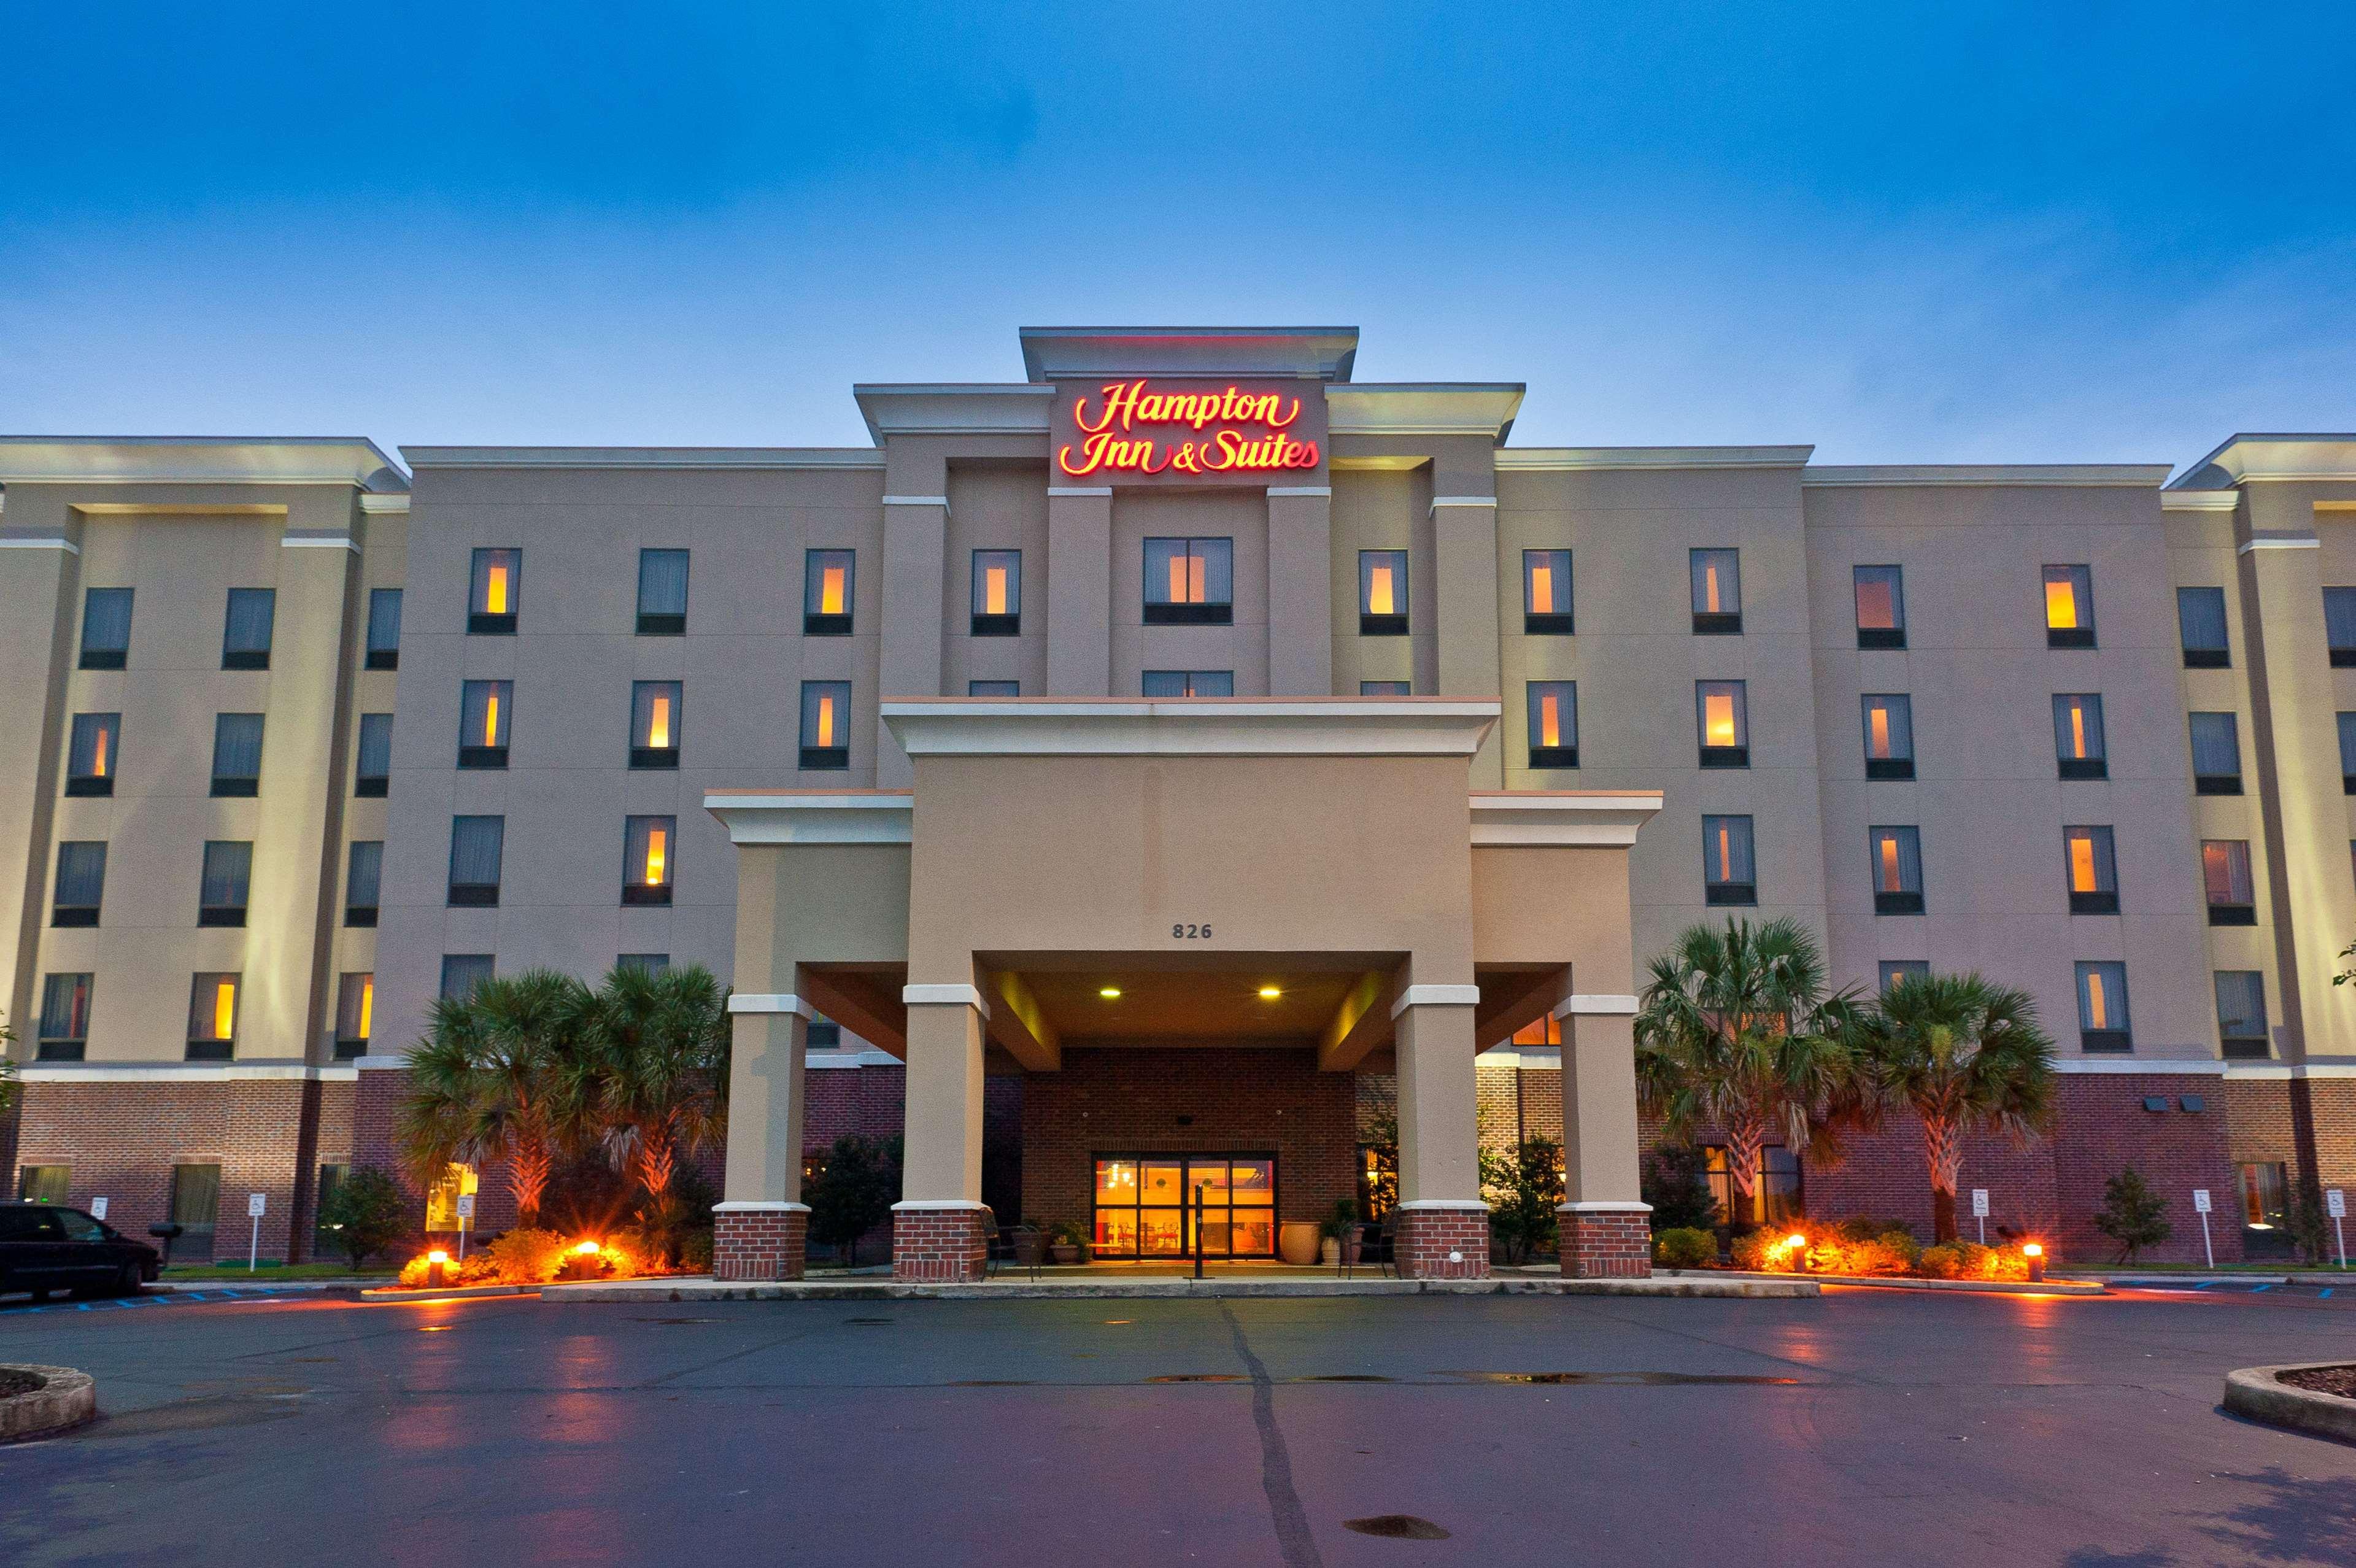 Hampton Inn & Suites Thibodaux image 0